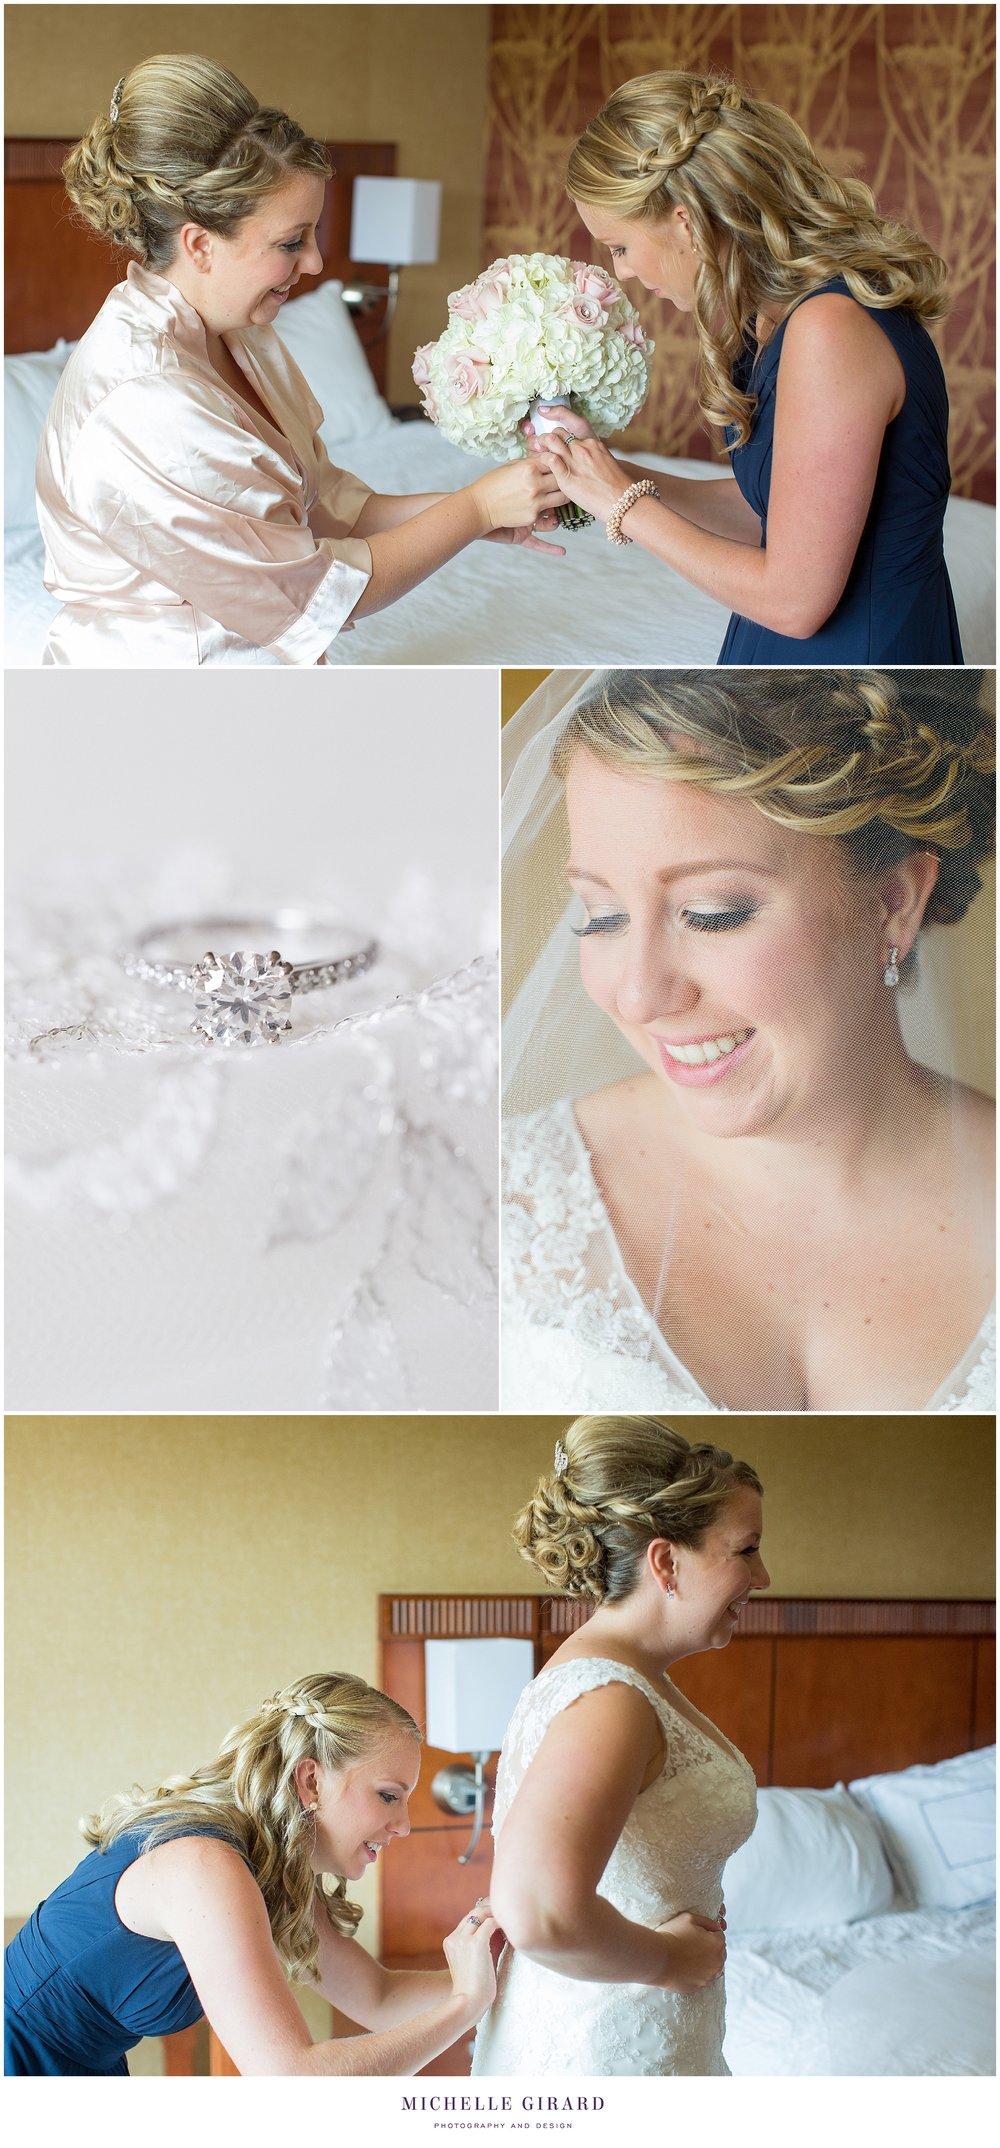 WeddingGettingReadyPhotography_ClassicSummerWedding_MichelleGirardPhotography2.jpg